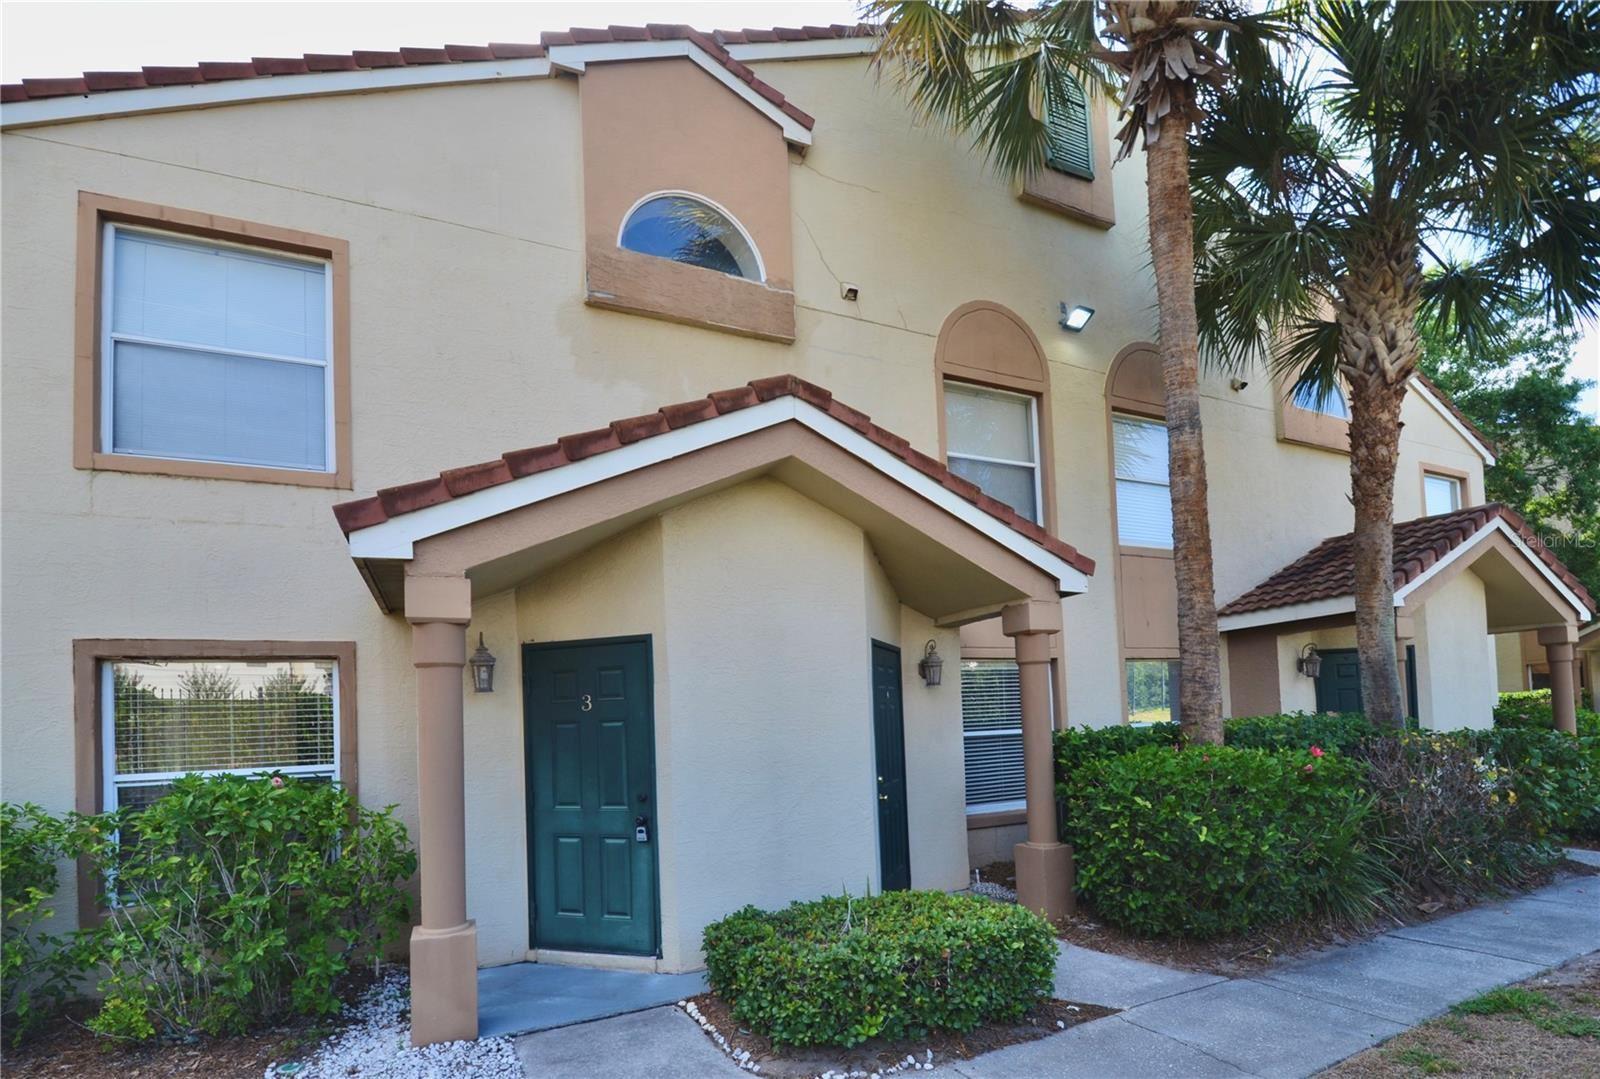 5448 E MICHIGAN STREET #3, Orlando, FL 32812 - MLS#: O5950394